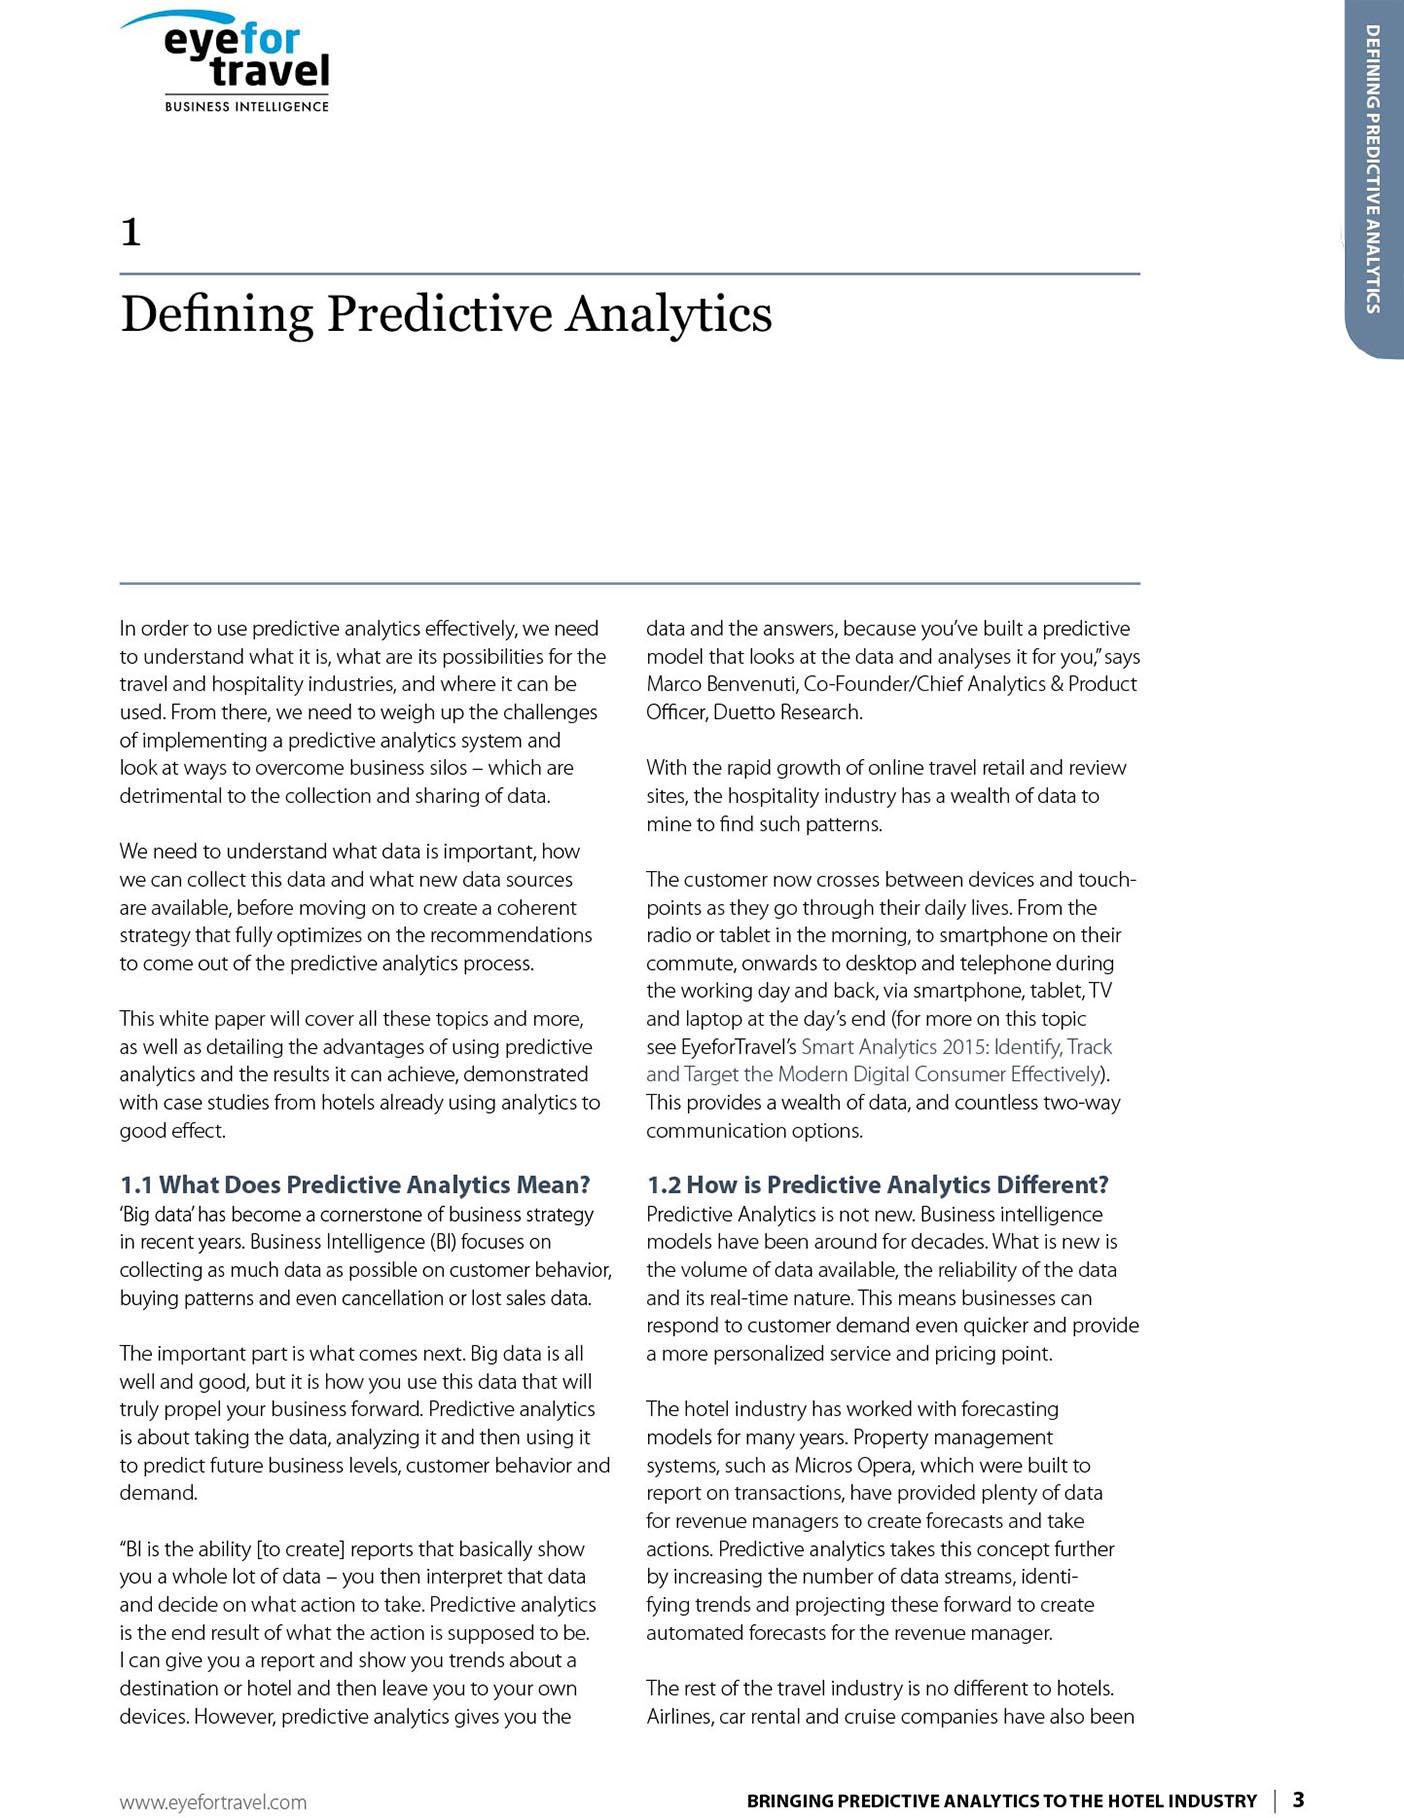 3-Bringing-Predictive-Analytics.jpg